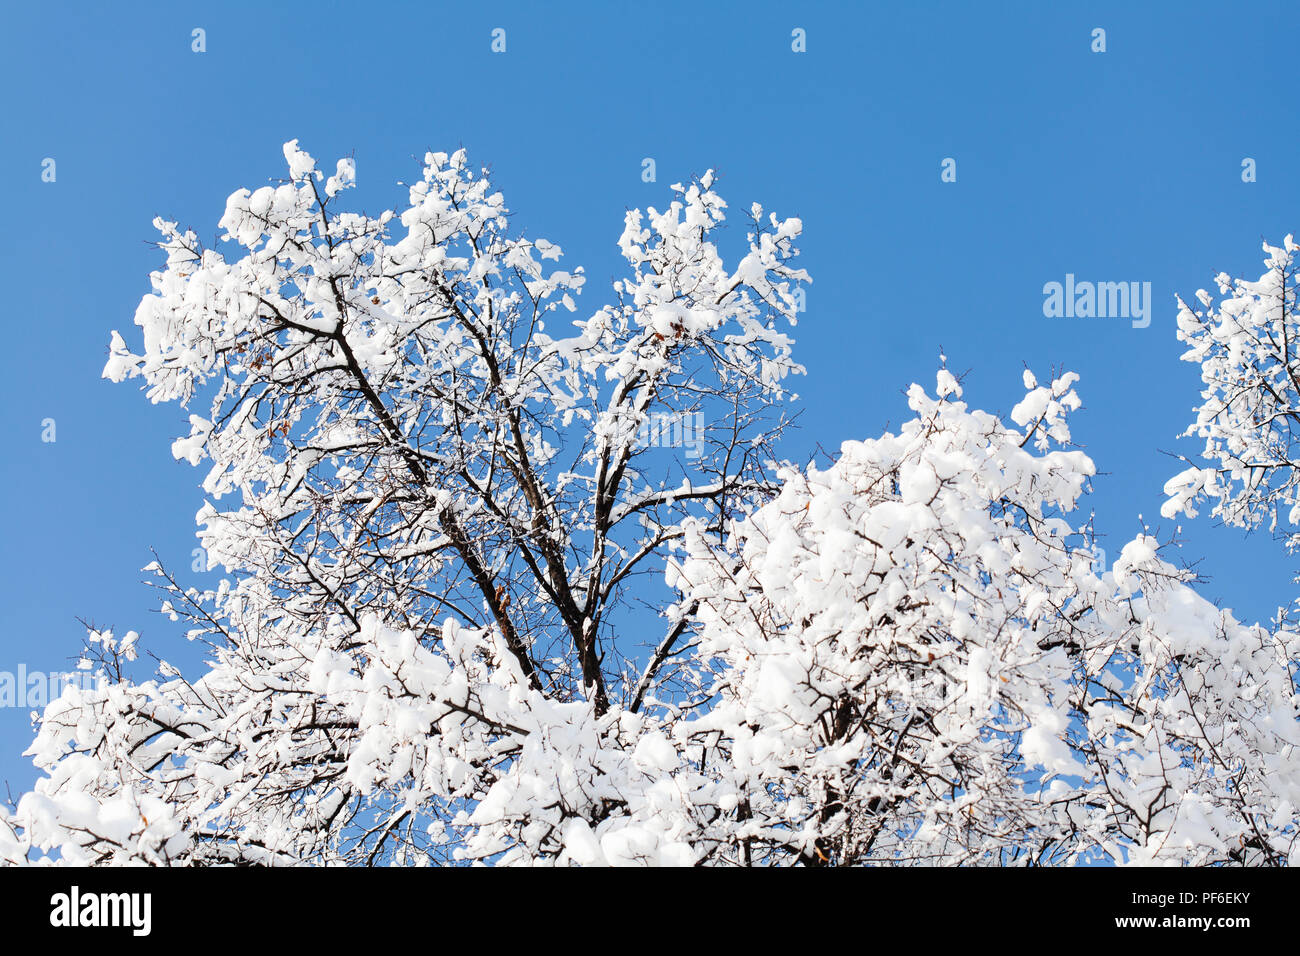 winter frost scenery tree bush snow stock photos winter frost